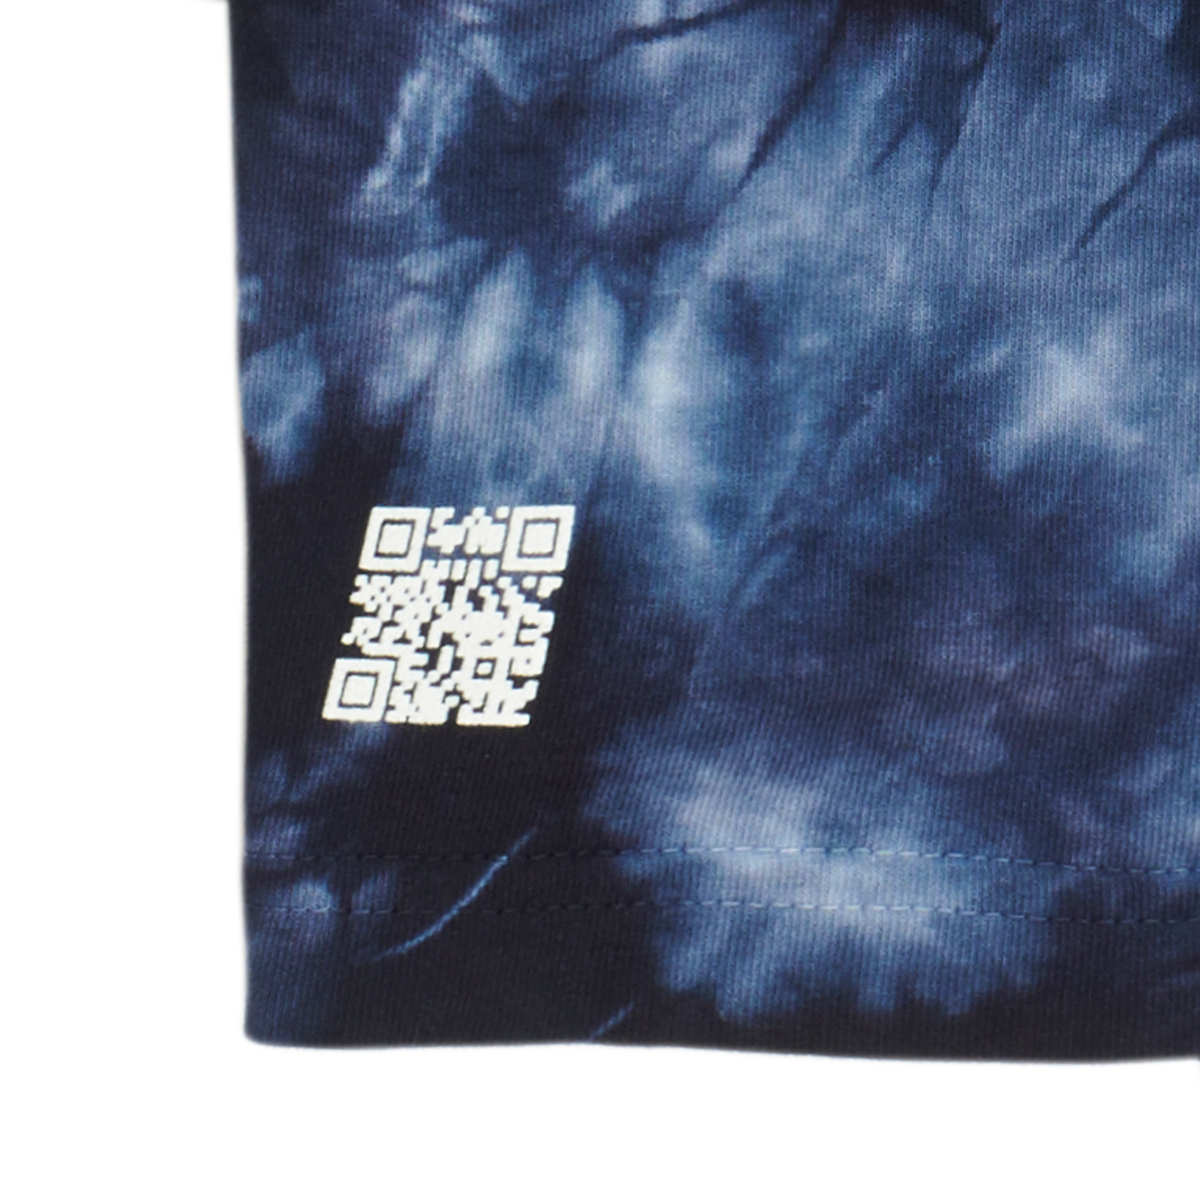 Dopamina Tie Dye T-Shirt